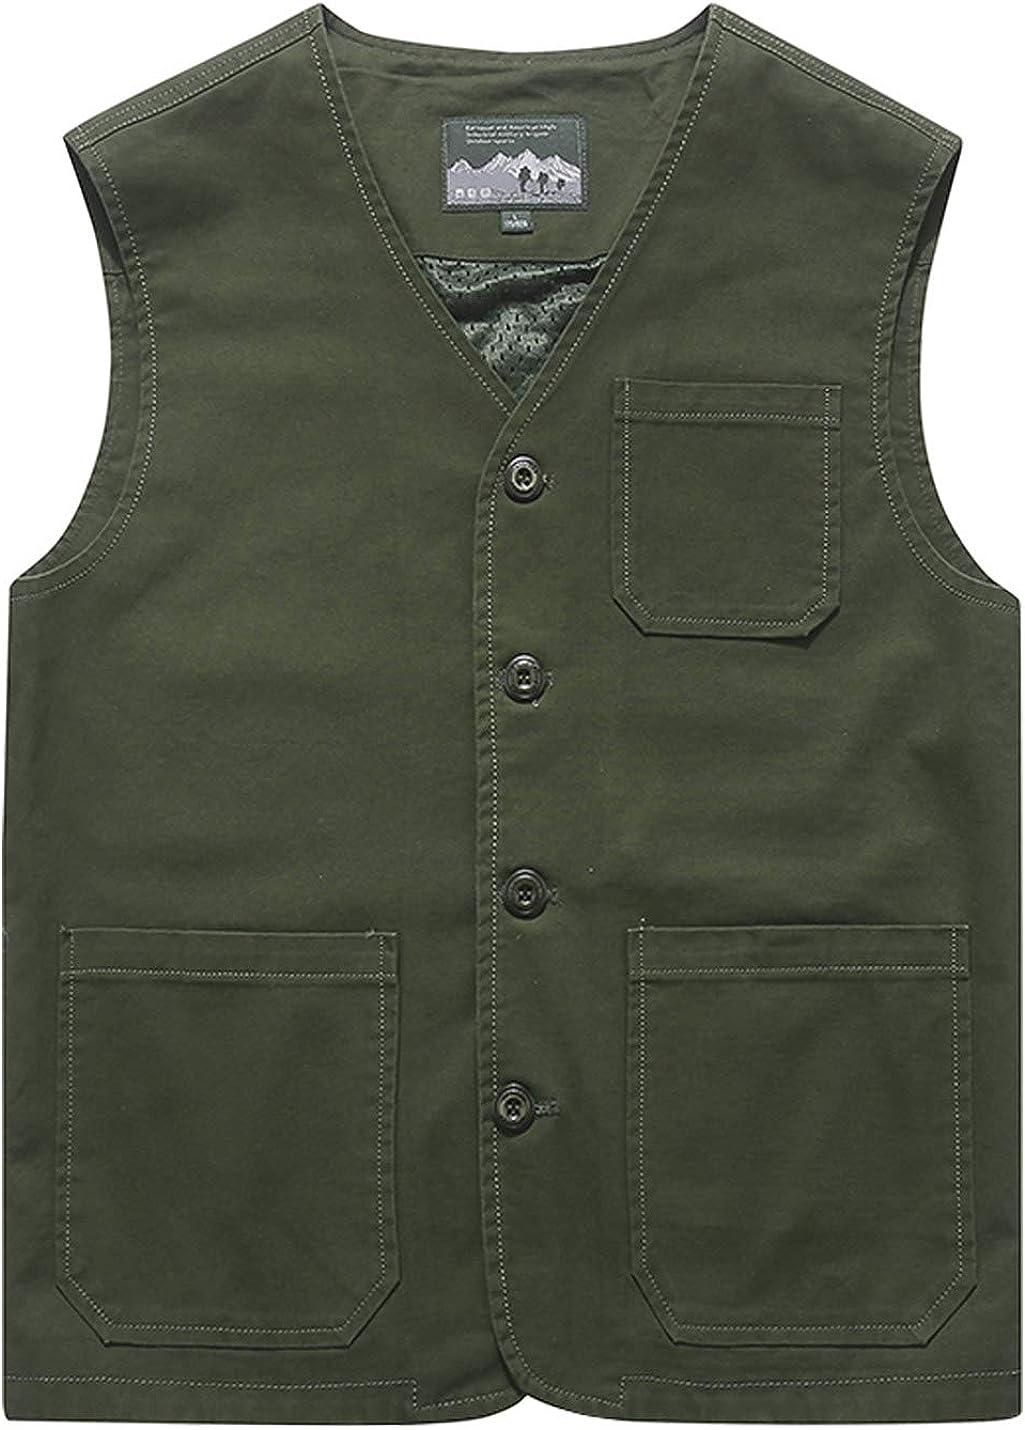 Gihuo Men's Casual Cotton 1 year warranty Outdoor Travel Philadelphia Mall Fishing Vest Safari